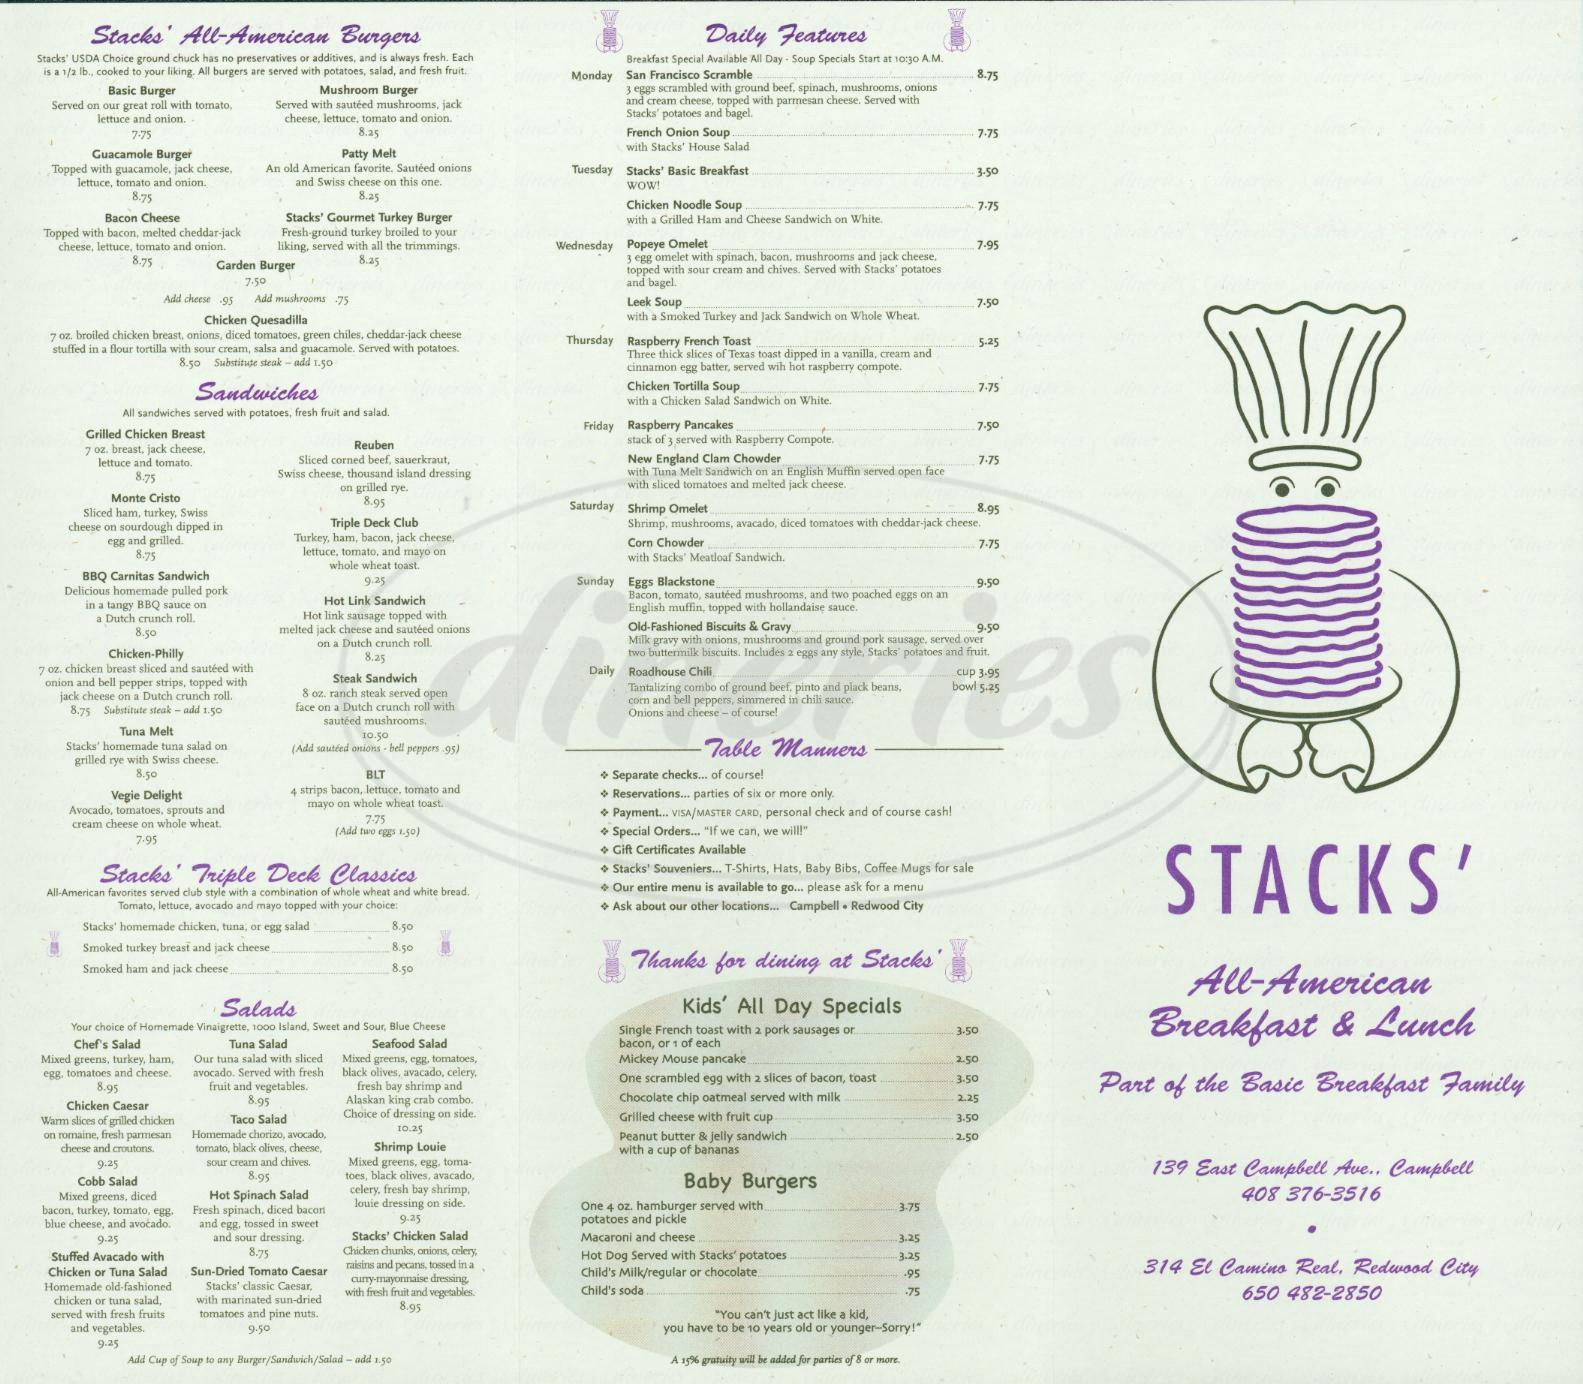 Stacks Restaurant Redwood City